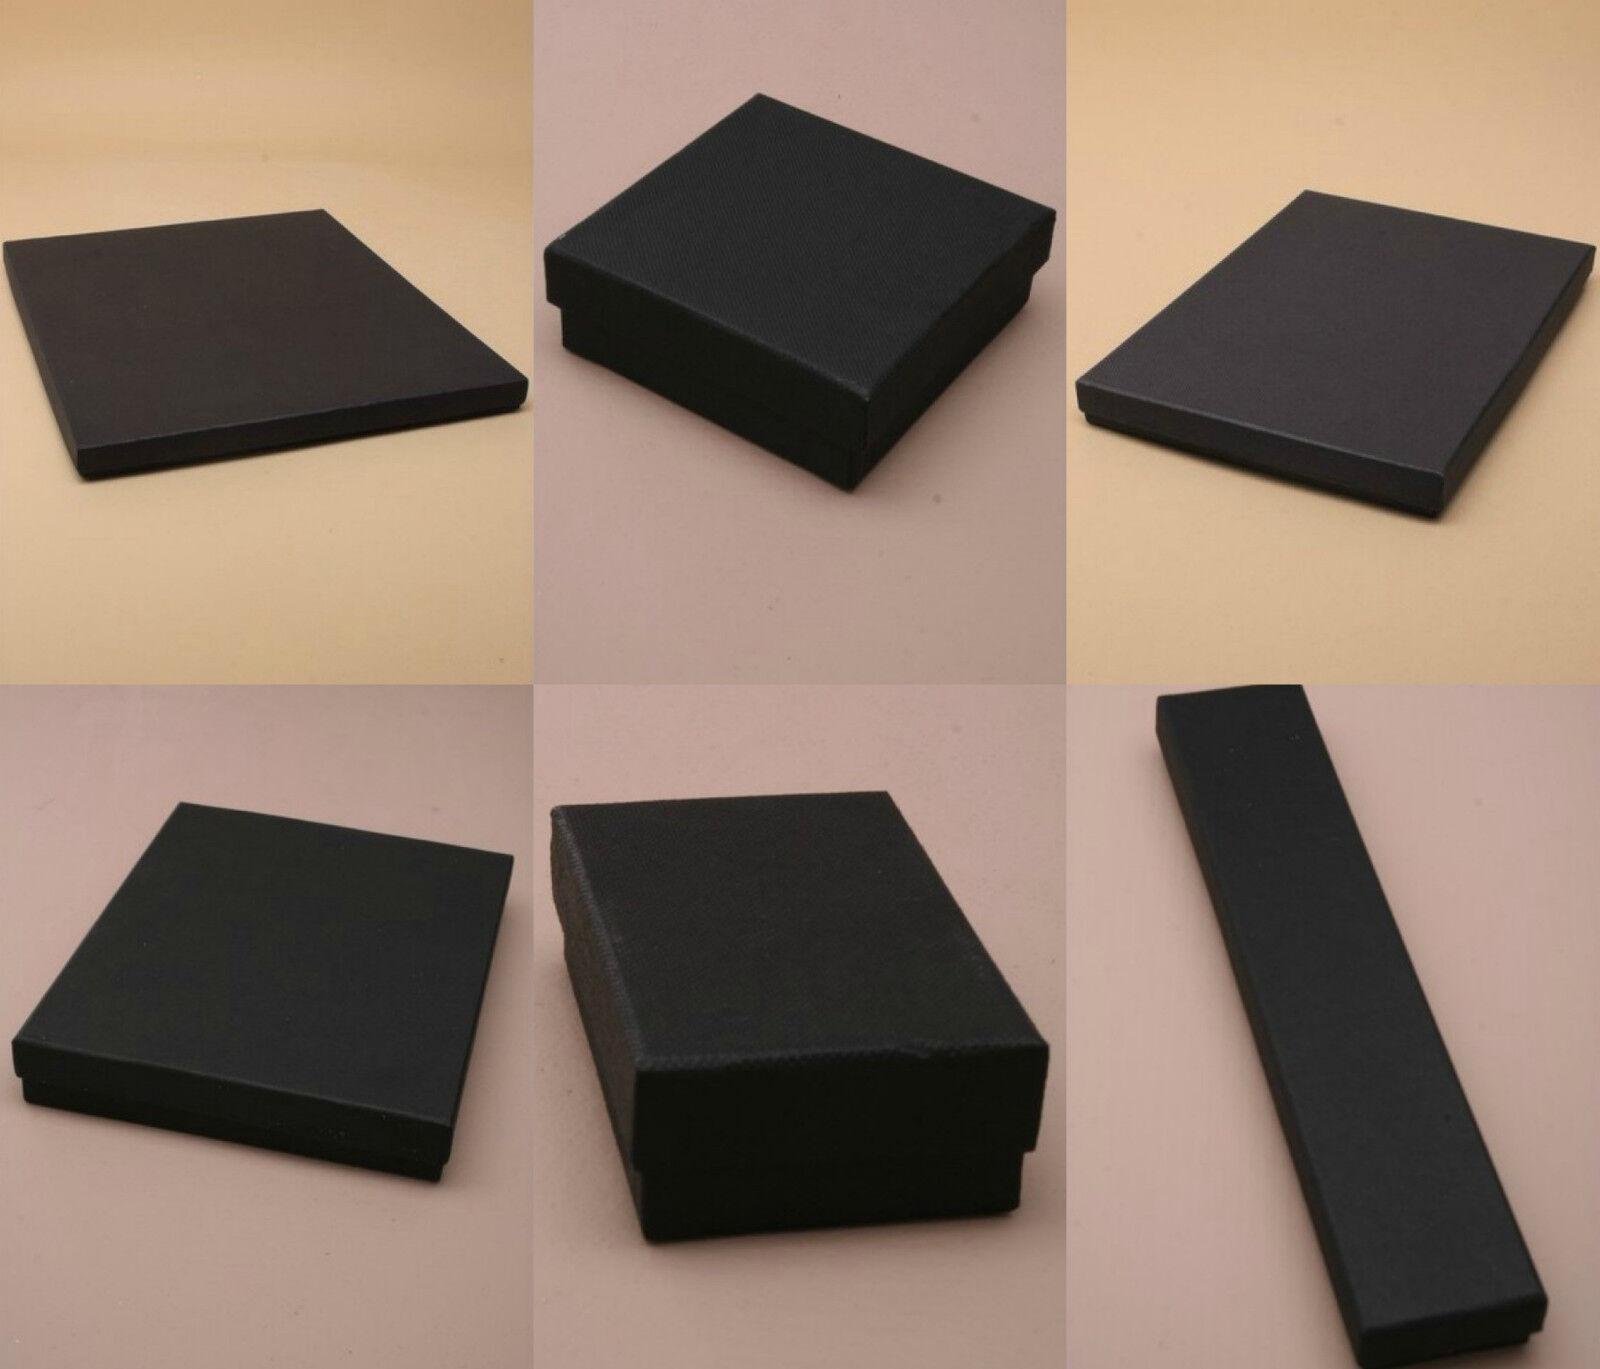 Jewellery - 1 x BLACK JEWELLERY GIFT BOX RING NECKLACE BRACELET EARRINGS WATCH SMALL PRESENT